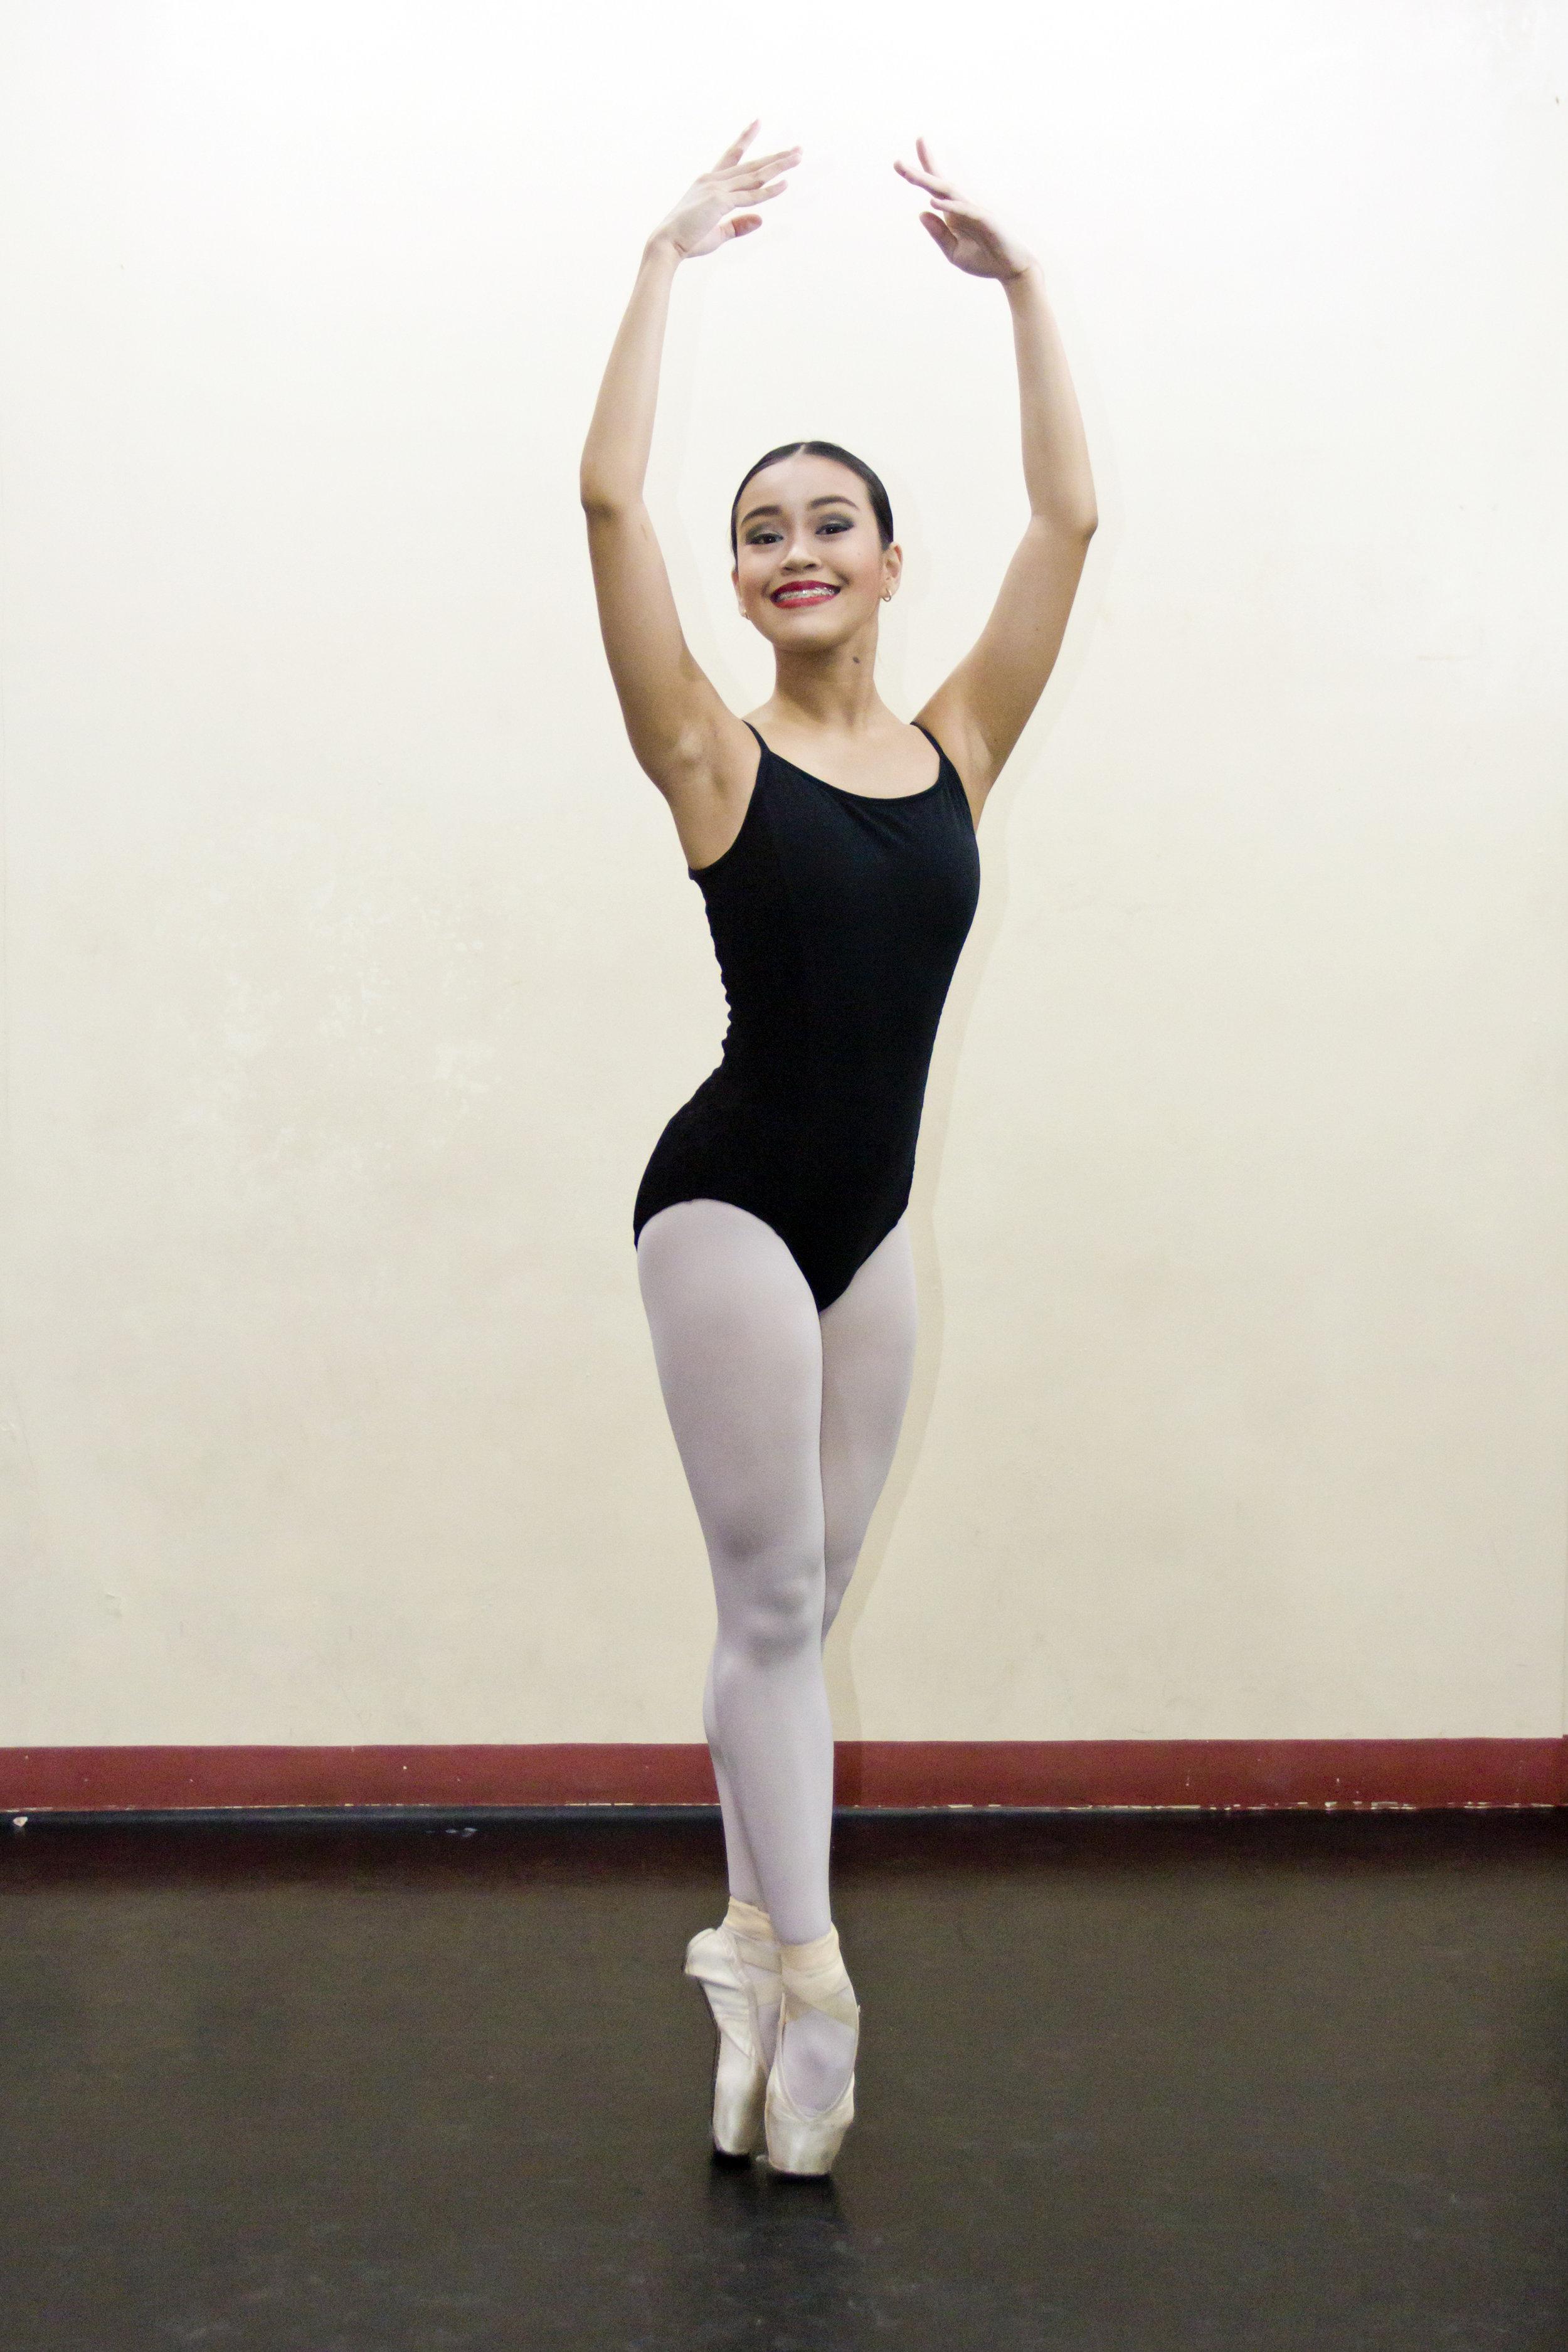 Ysabelle Ashley Salonga